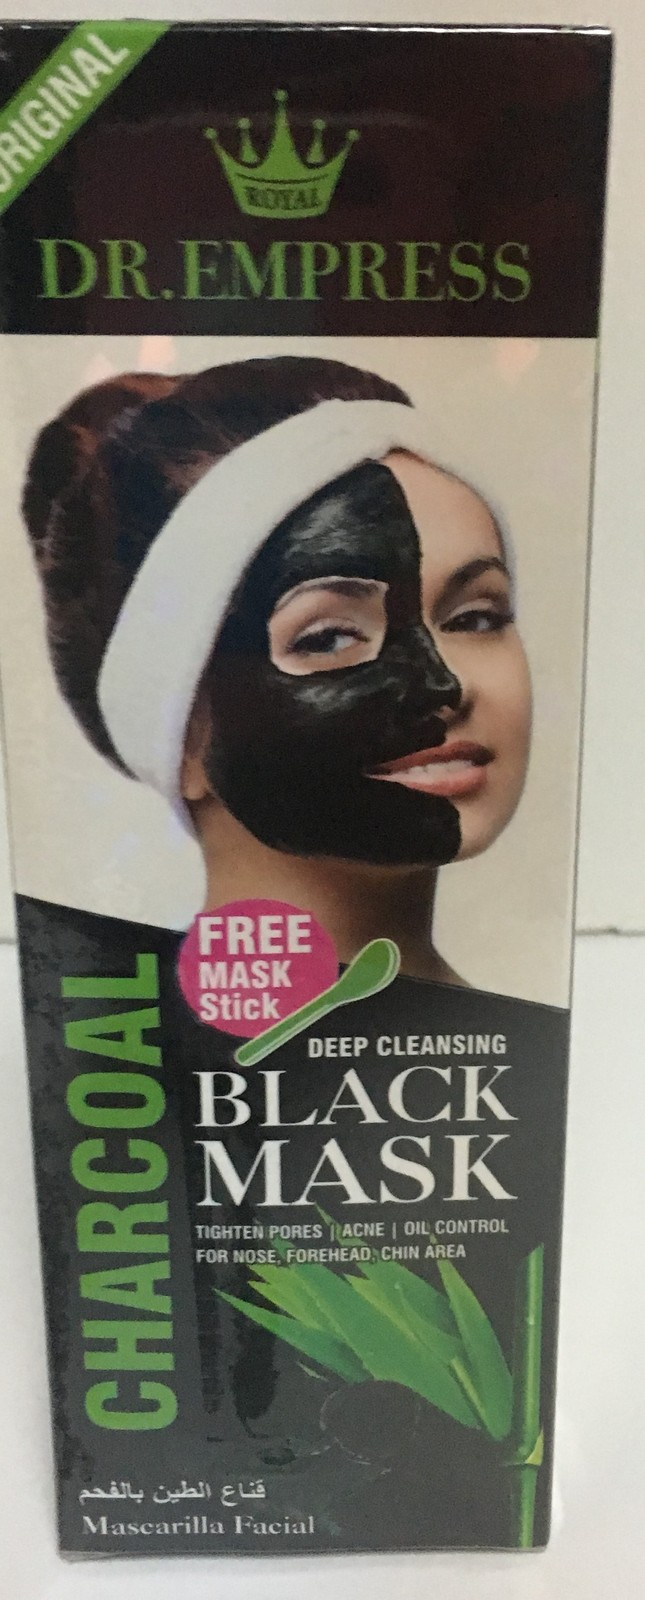 Dr. Empress Black Mask Deep Cleaning Tightens Pores 4.05 OZ